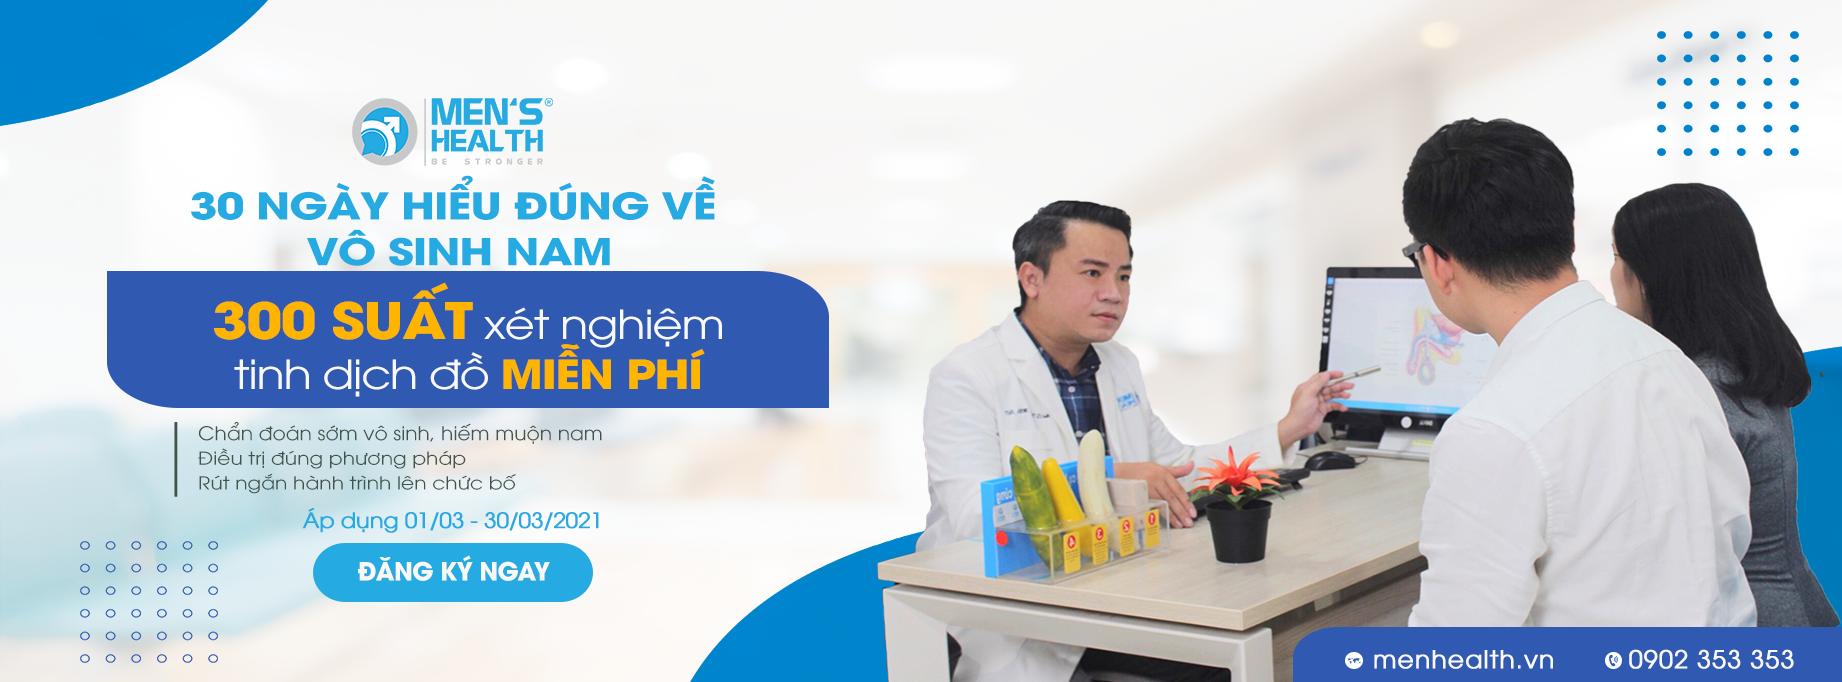 30ngayhieudungvosinhnam - banner web